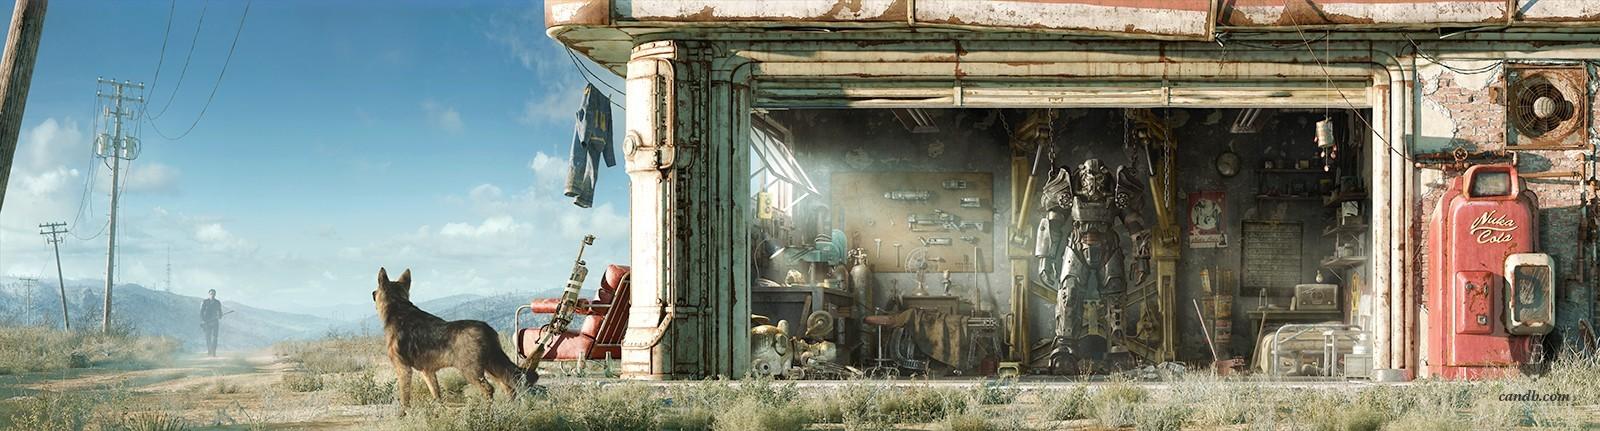 artwork garage exterior fallout 4 bethesda softworks